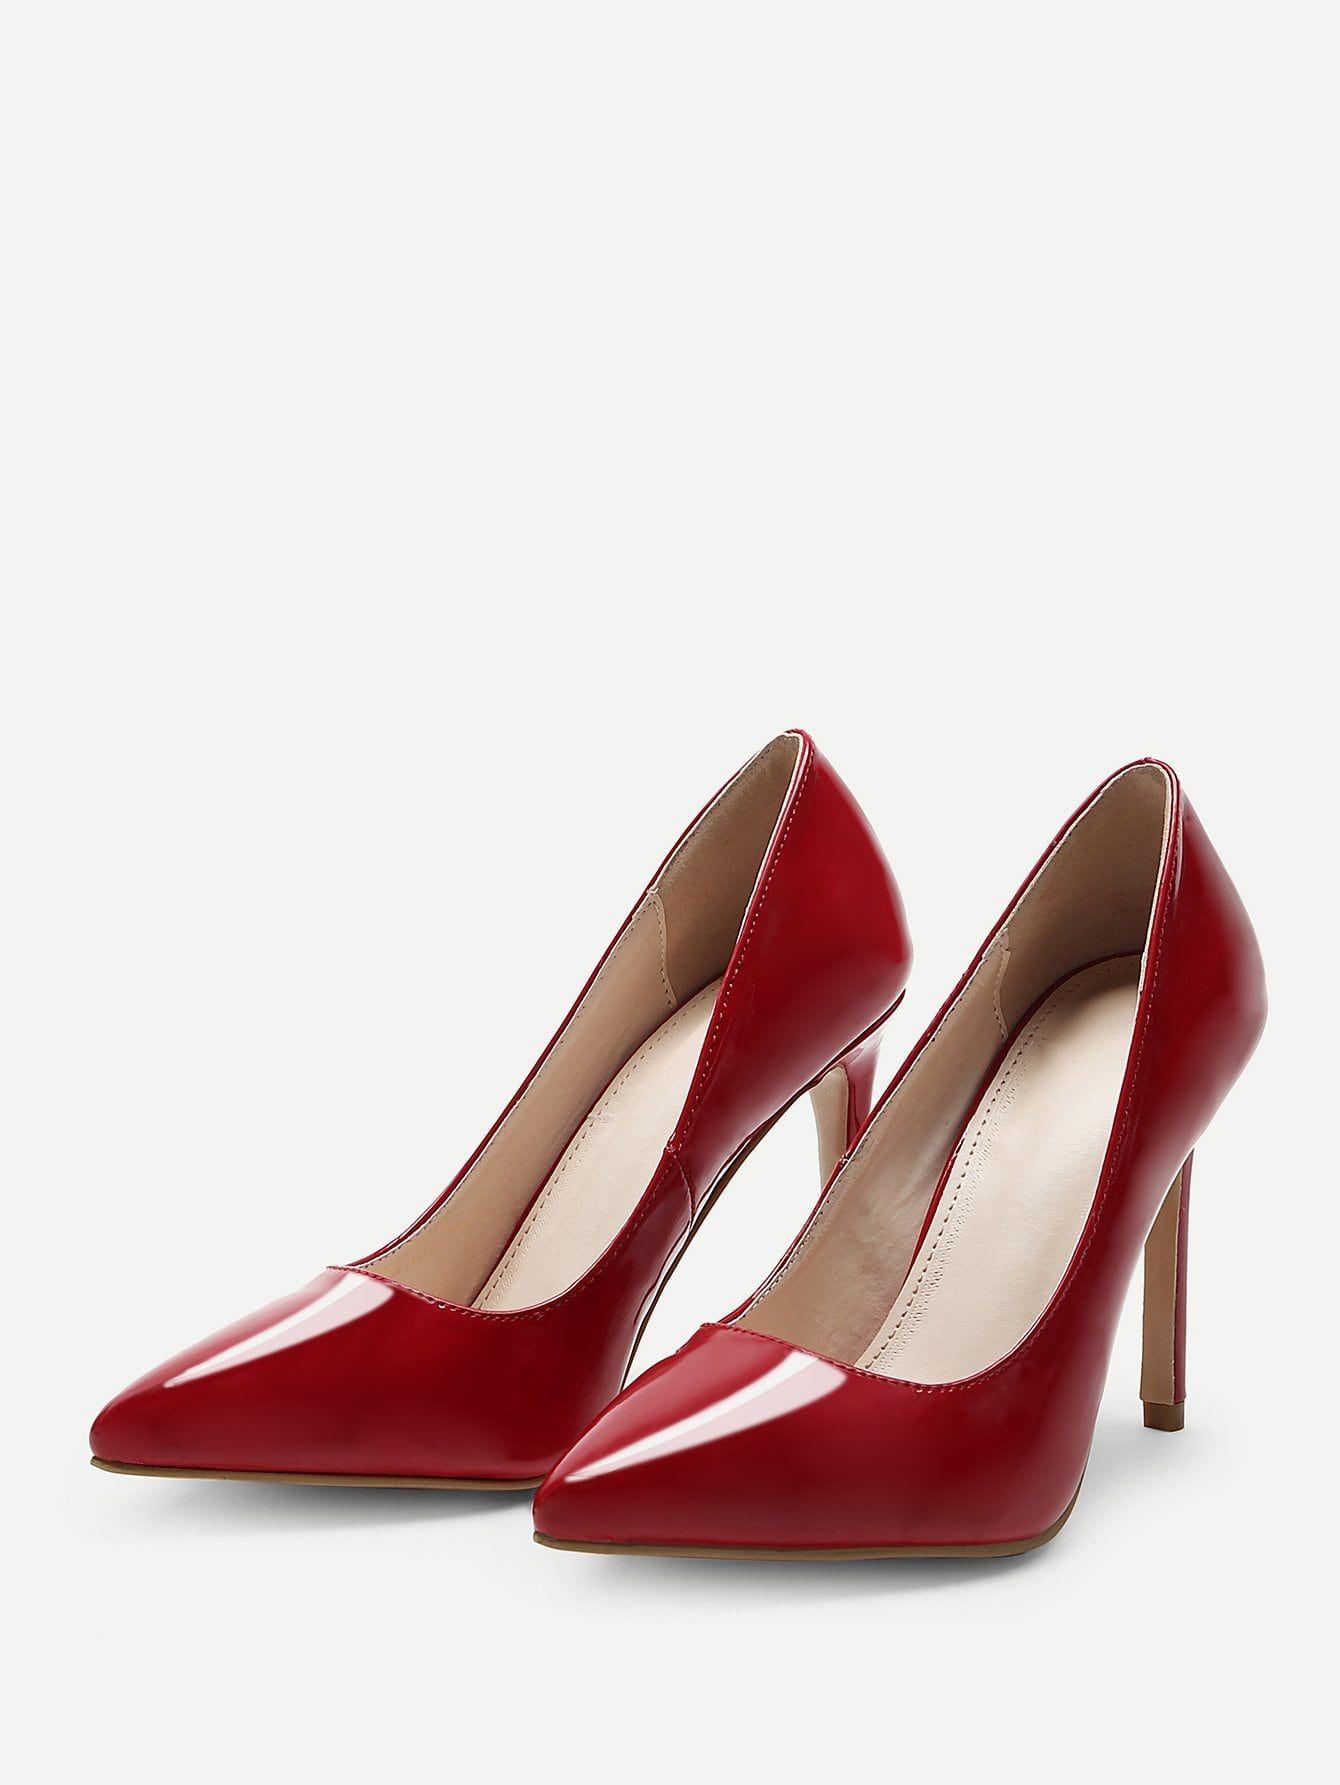 315983b37fa Elegant Point Toe Red High Heel Stiletto Plain Stiletto Heels in ...